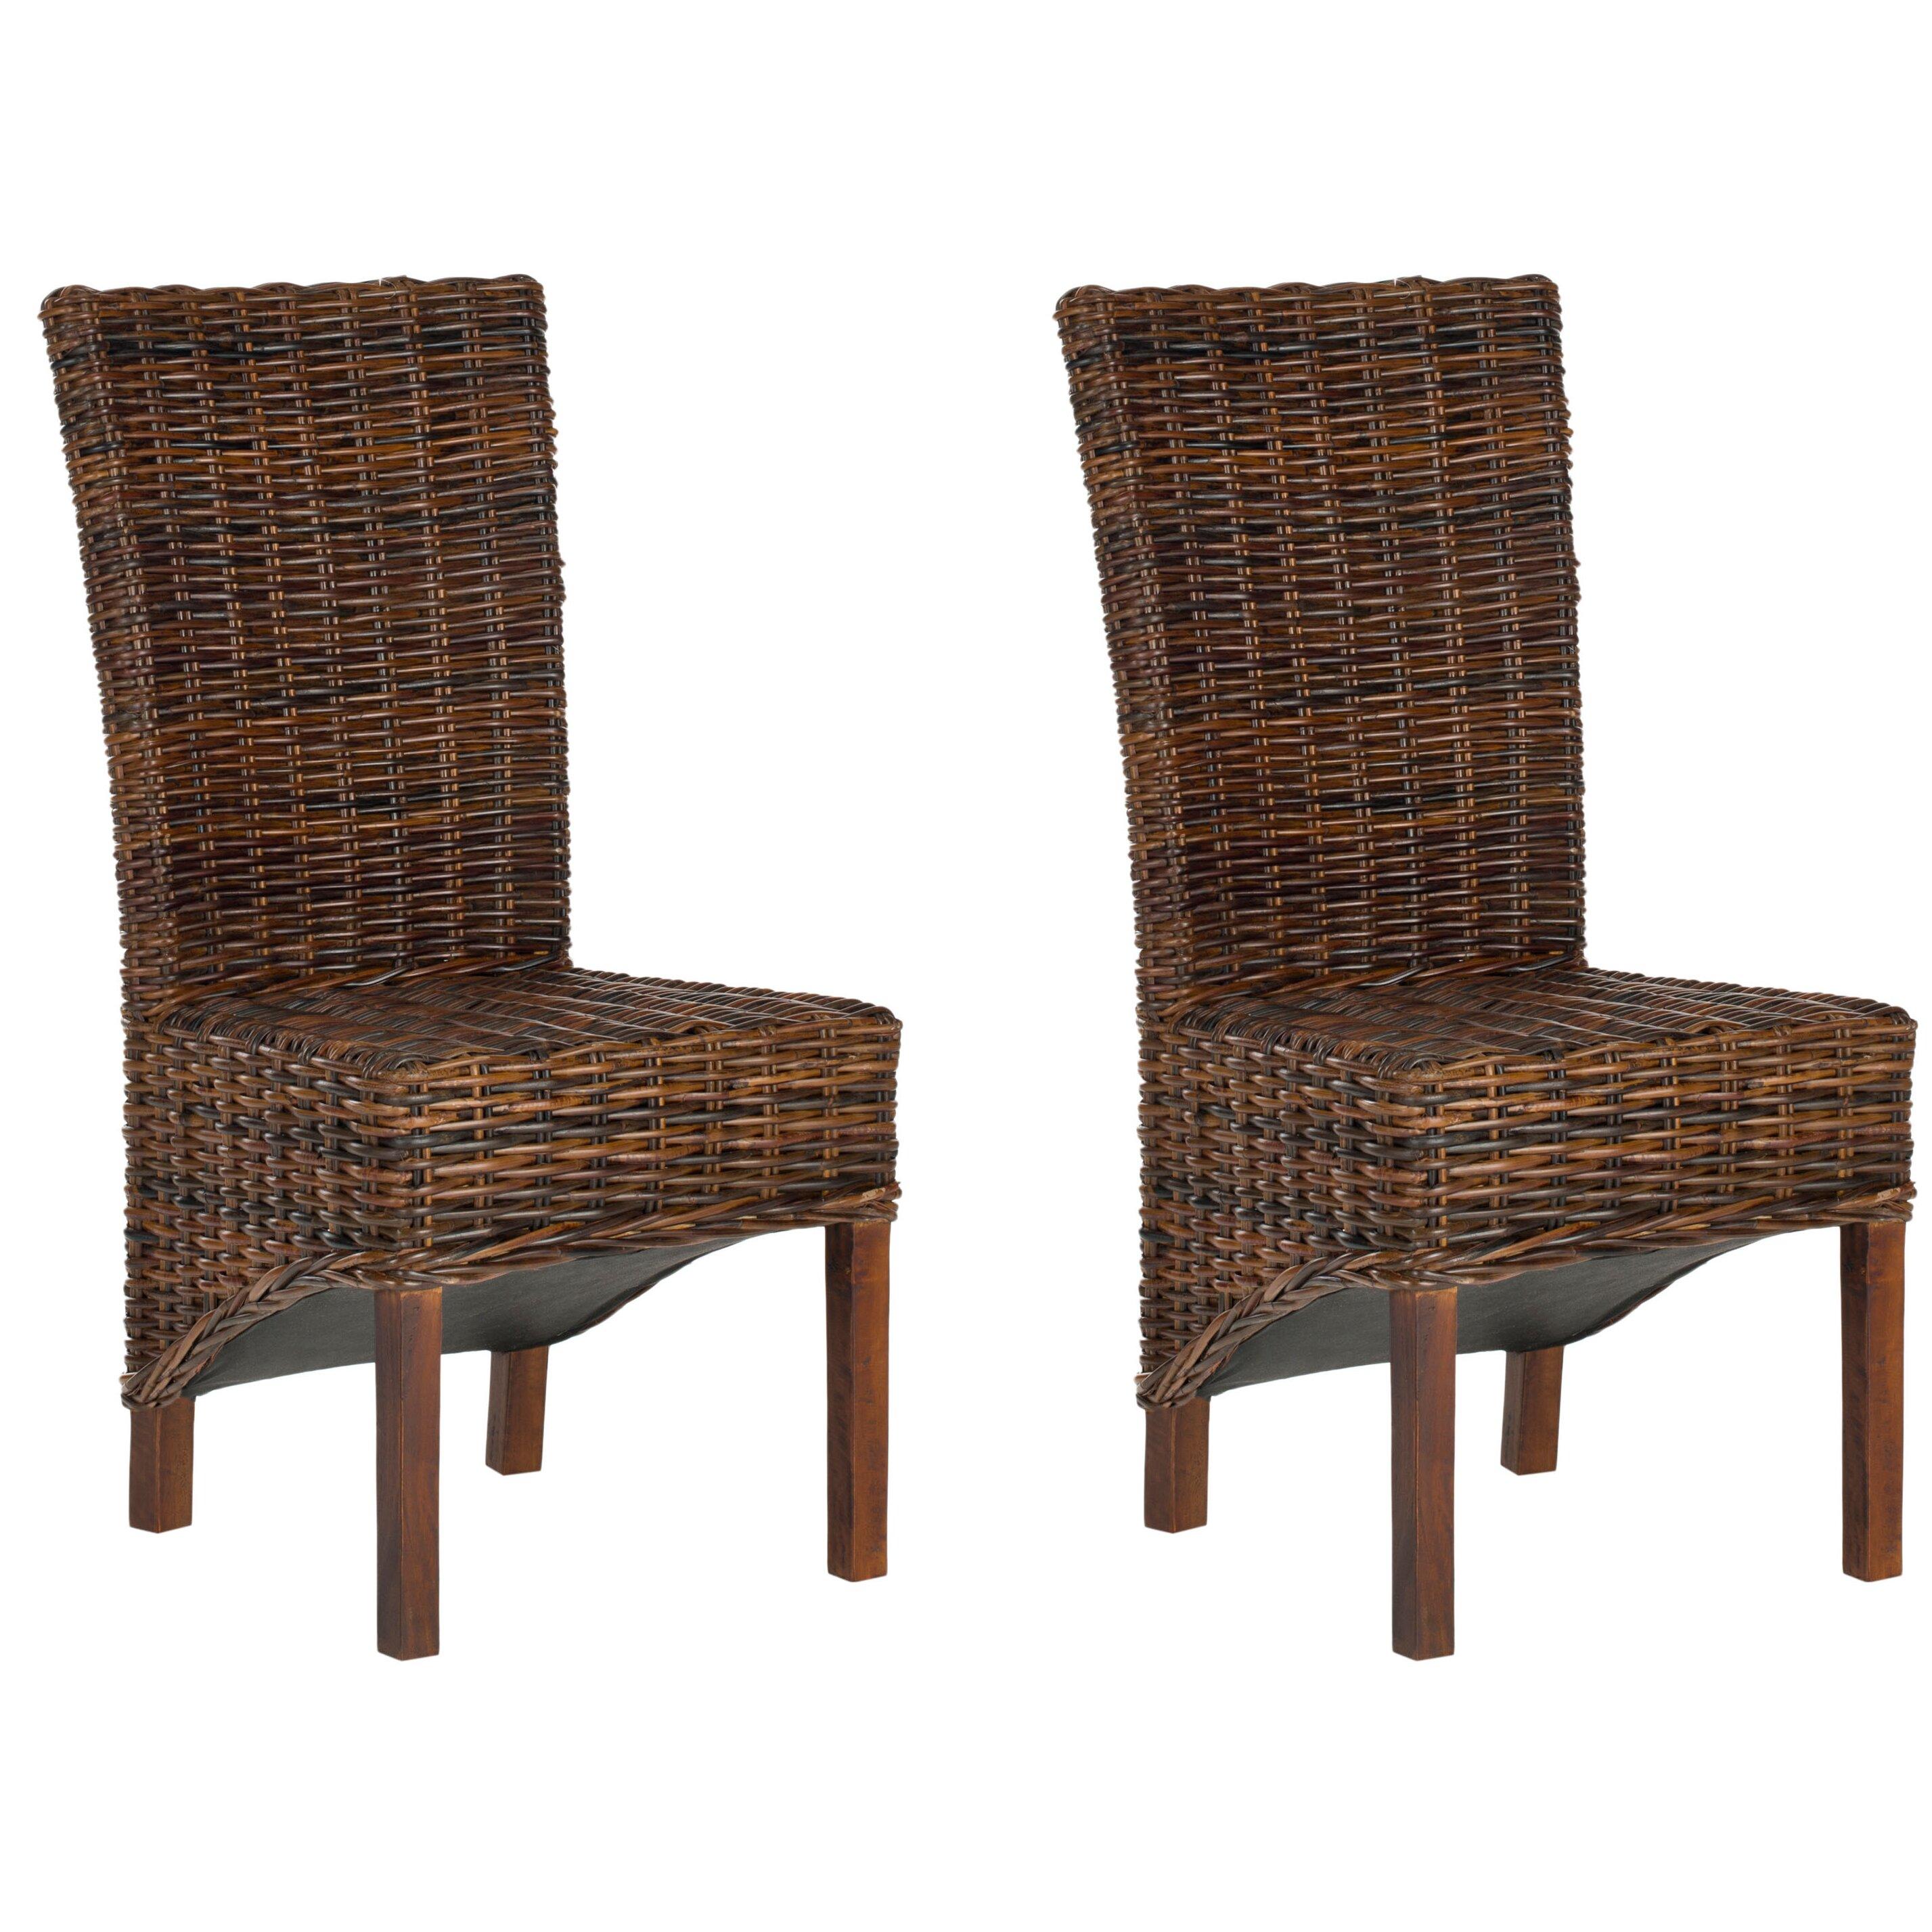 safavieh ridge side chair reviews wayfair. Black Bedroom Furniture Sets. Home Design Ideas